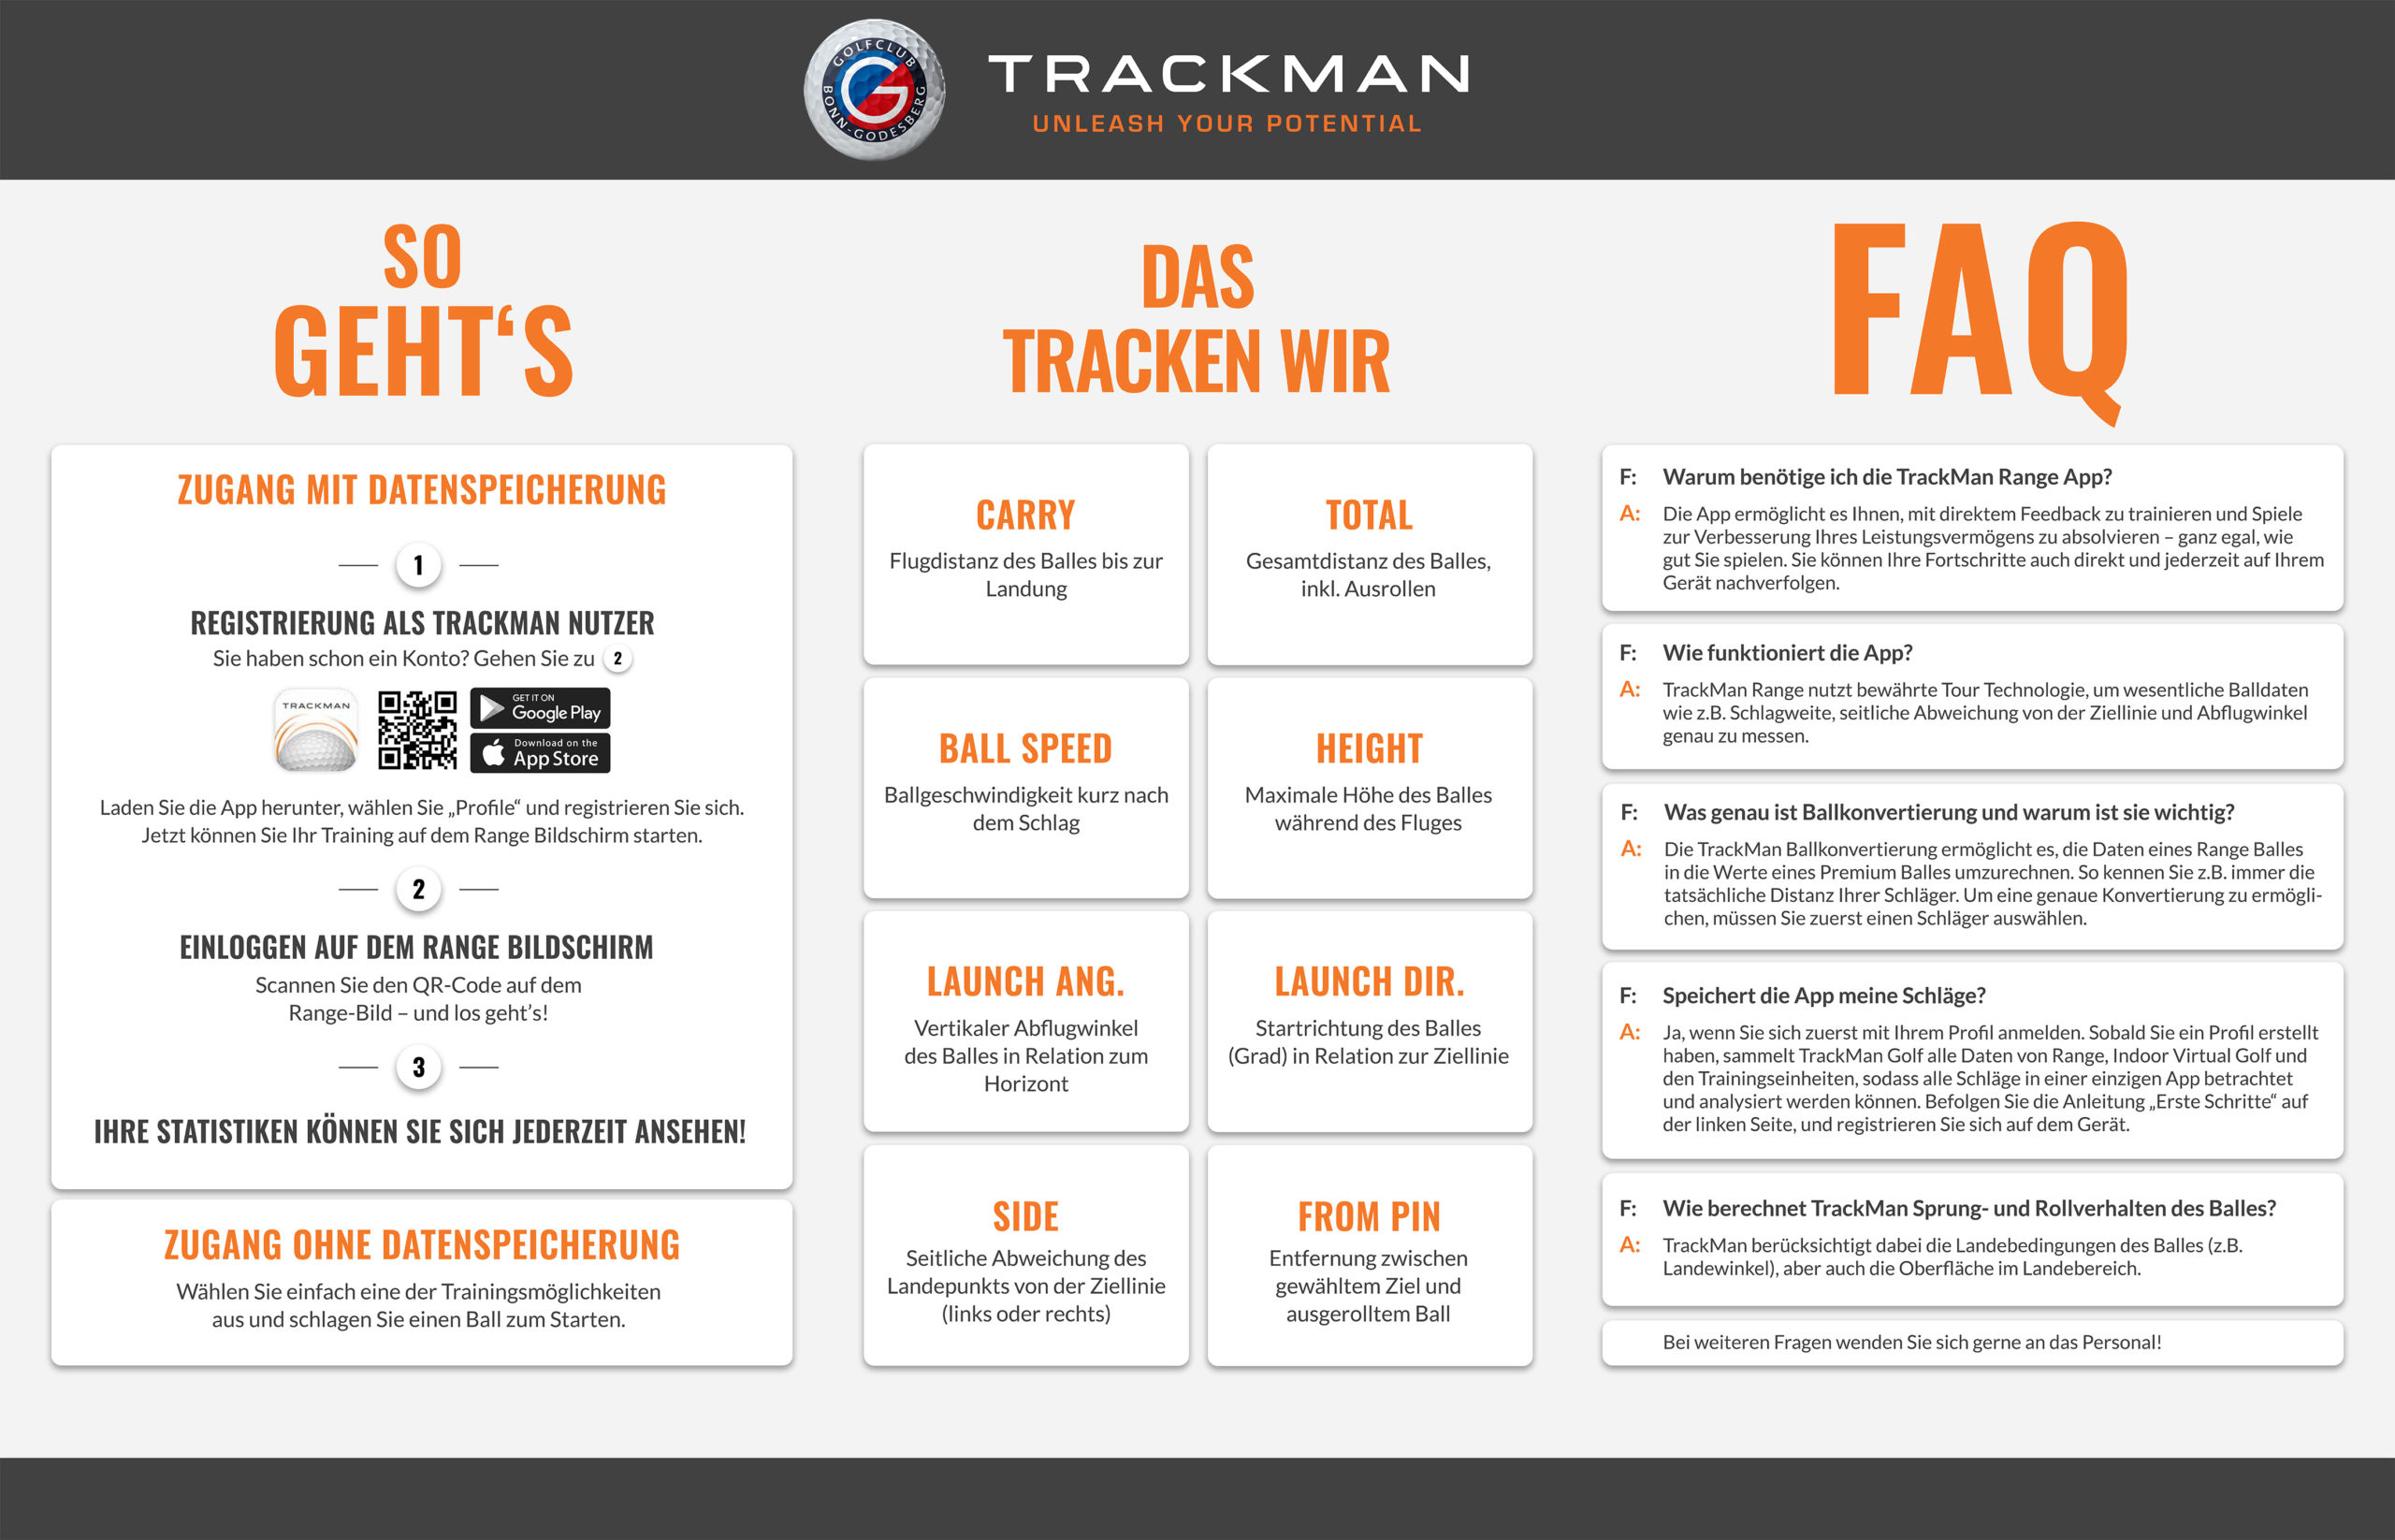 Trackman so gehts